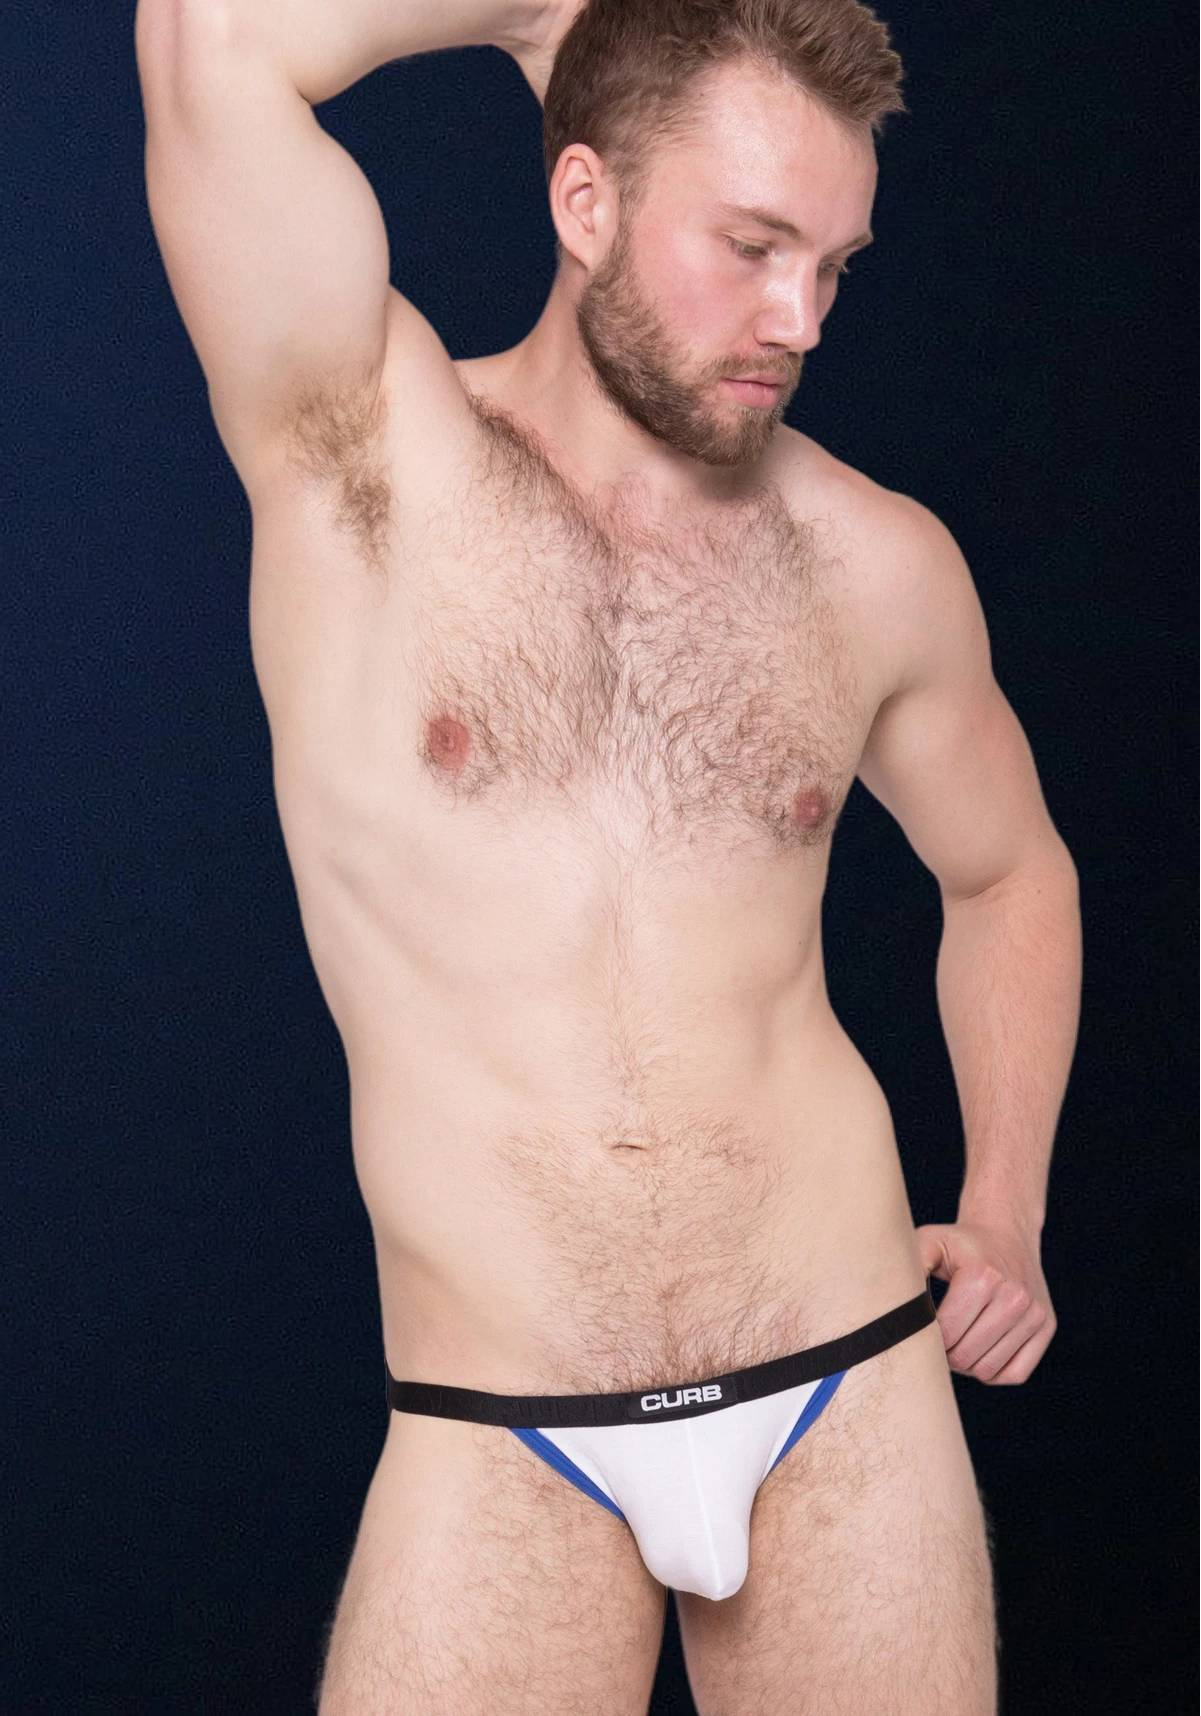 Curbwear Bulge Jock | White